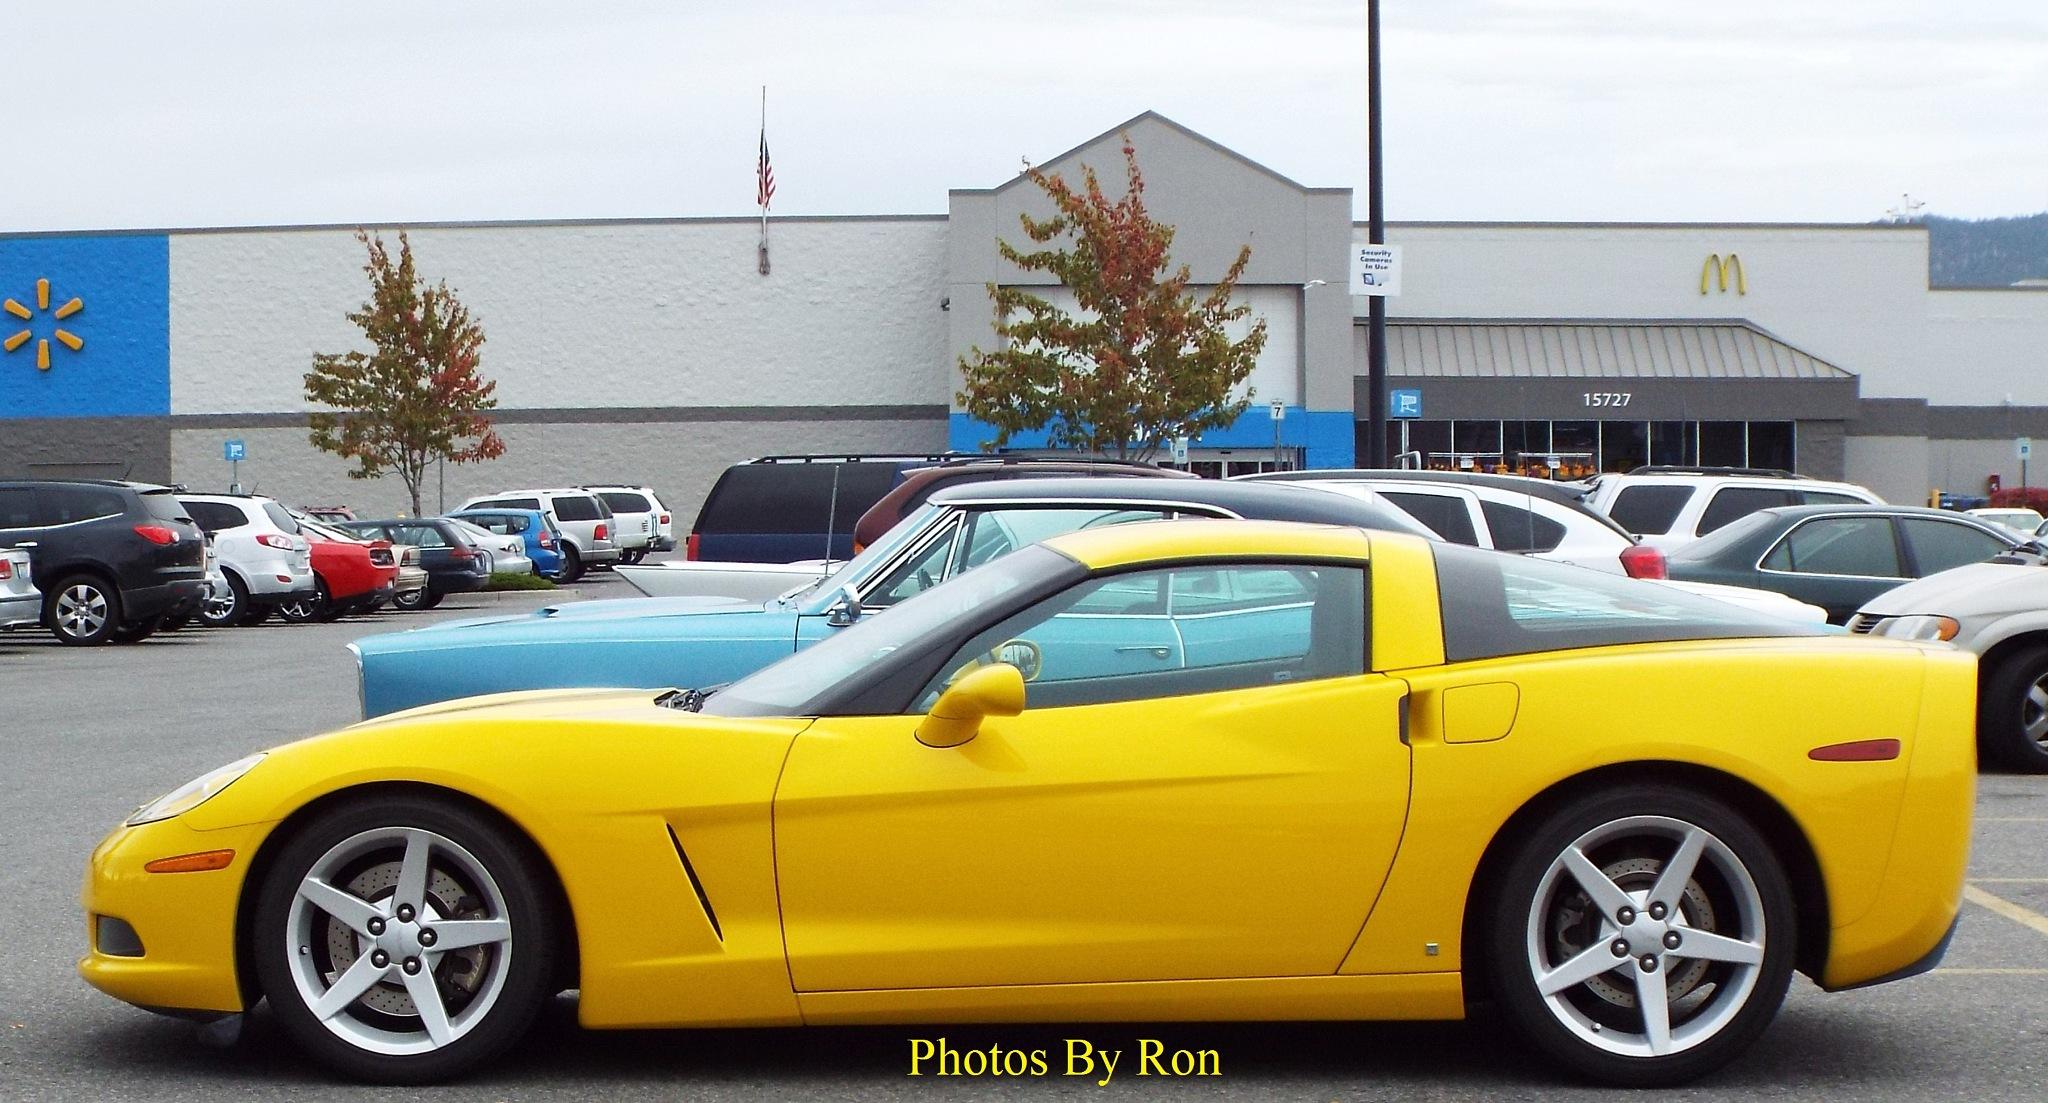 """Canary Yellow Corvette""   Pic #2 by Ron Berkley"